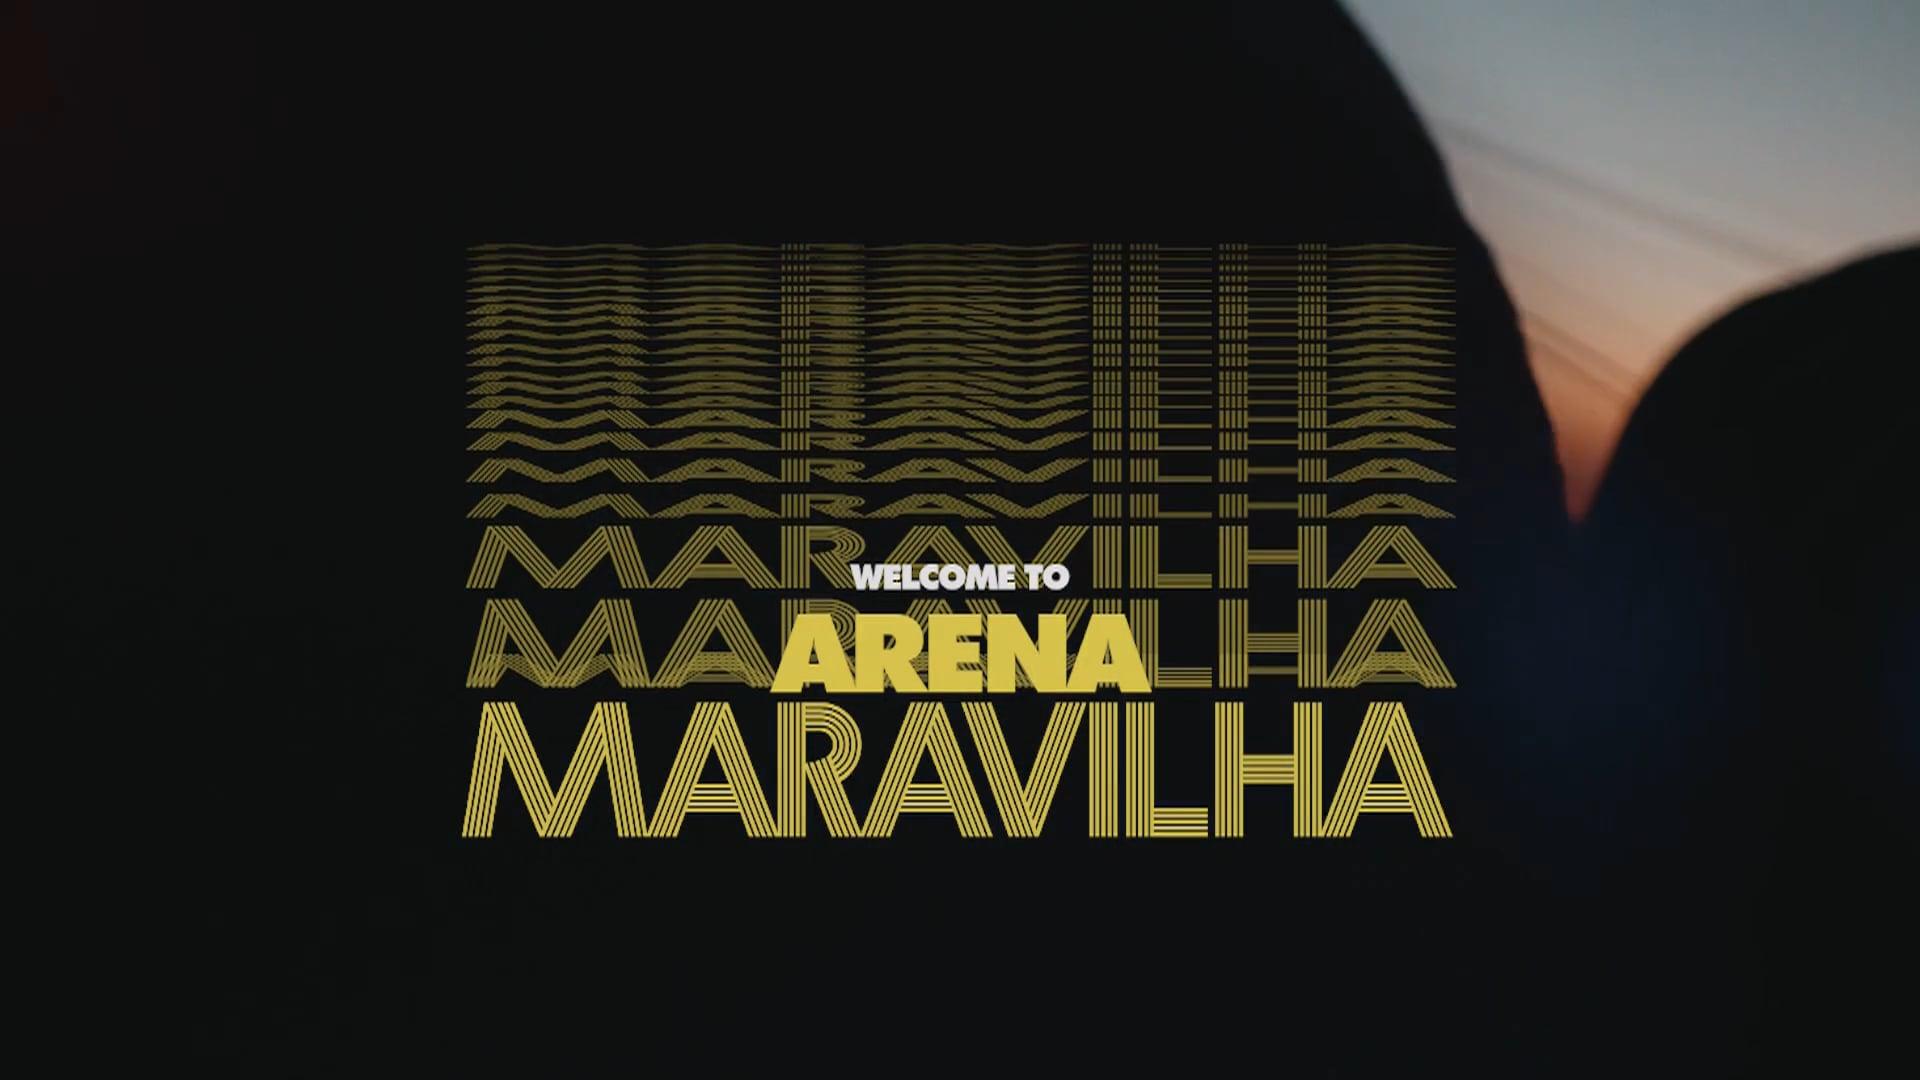 ARENA MARAVILHA 2019